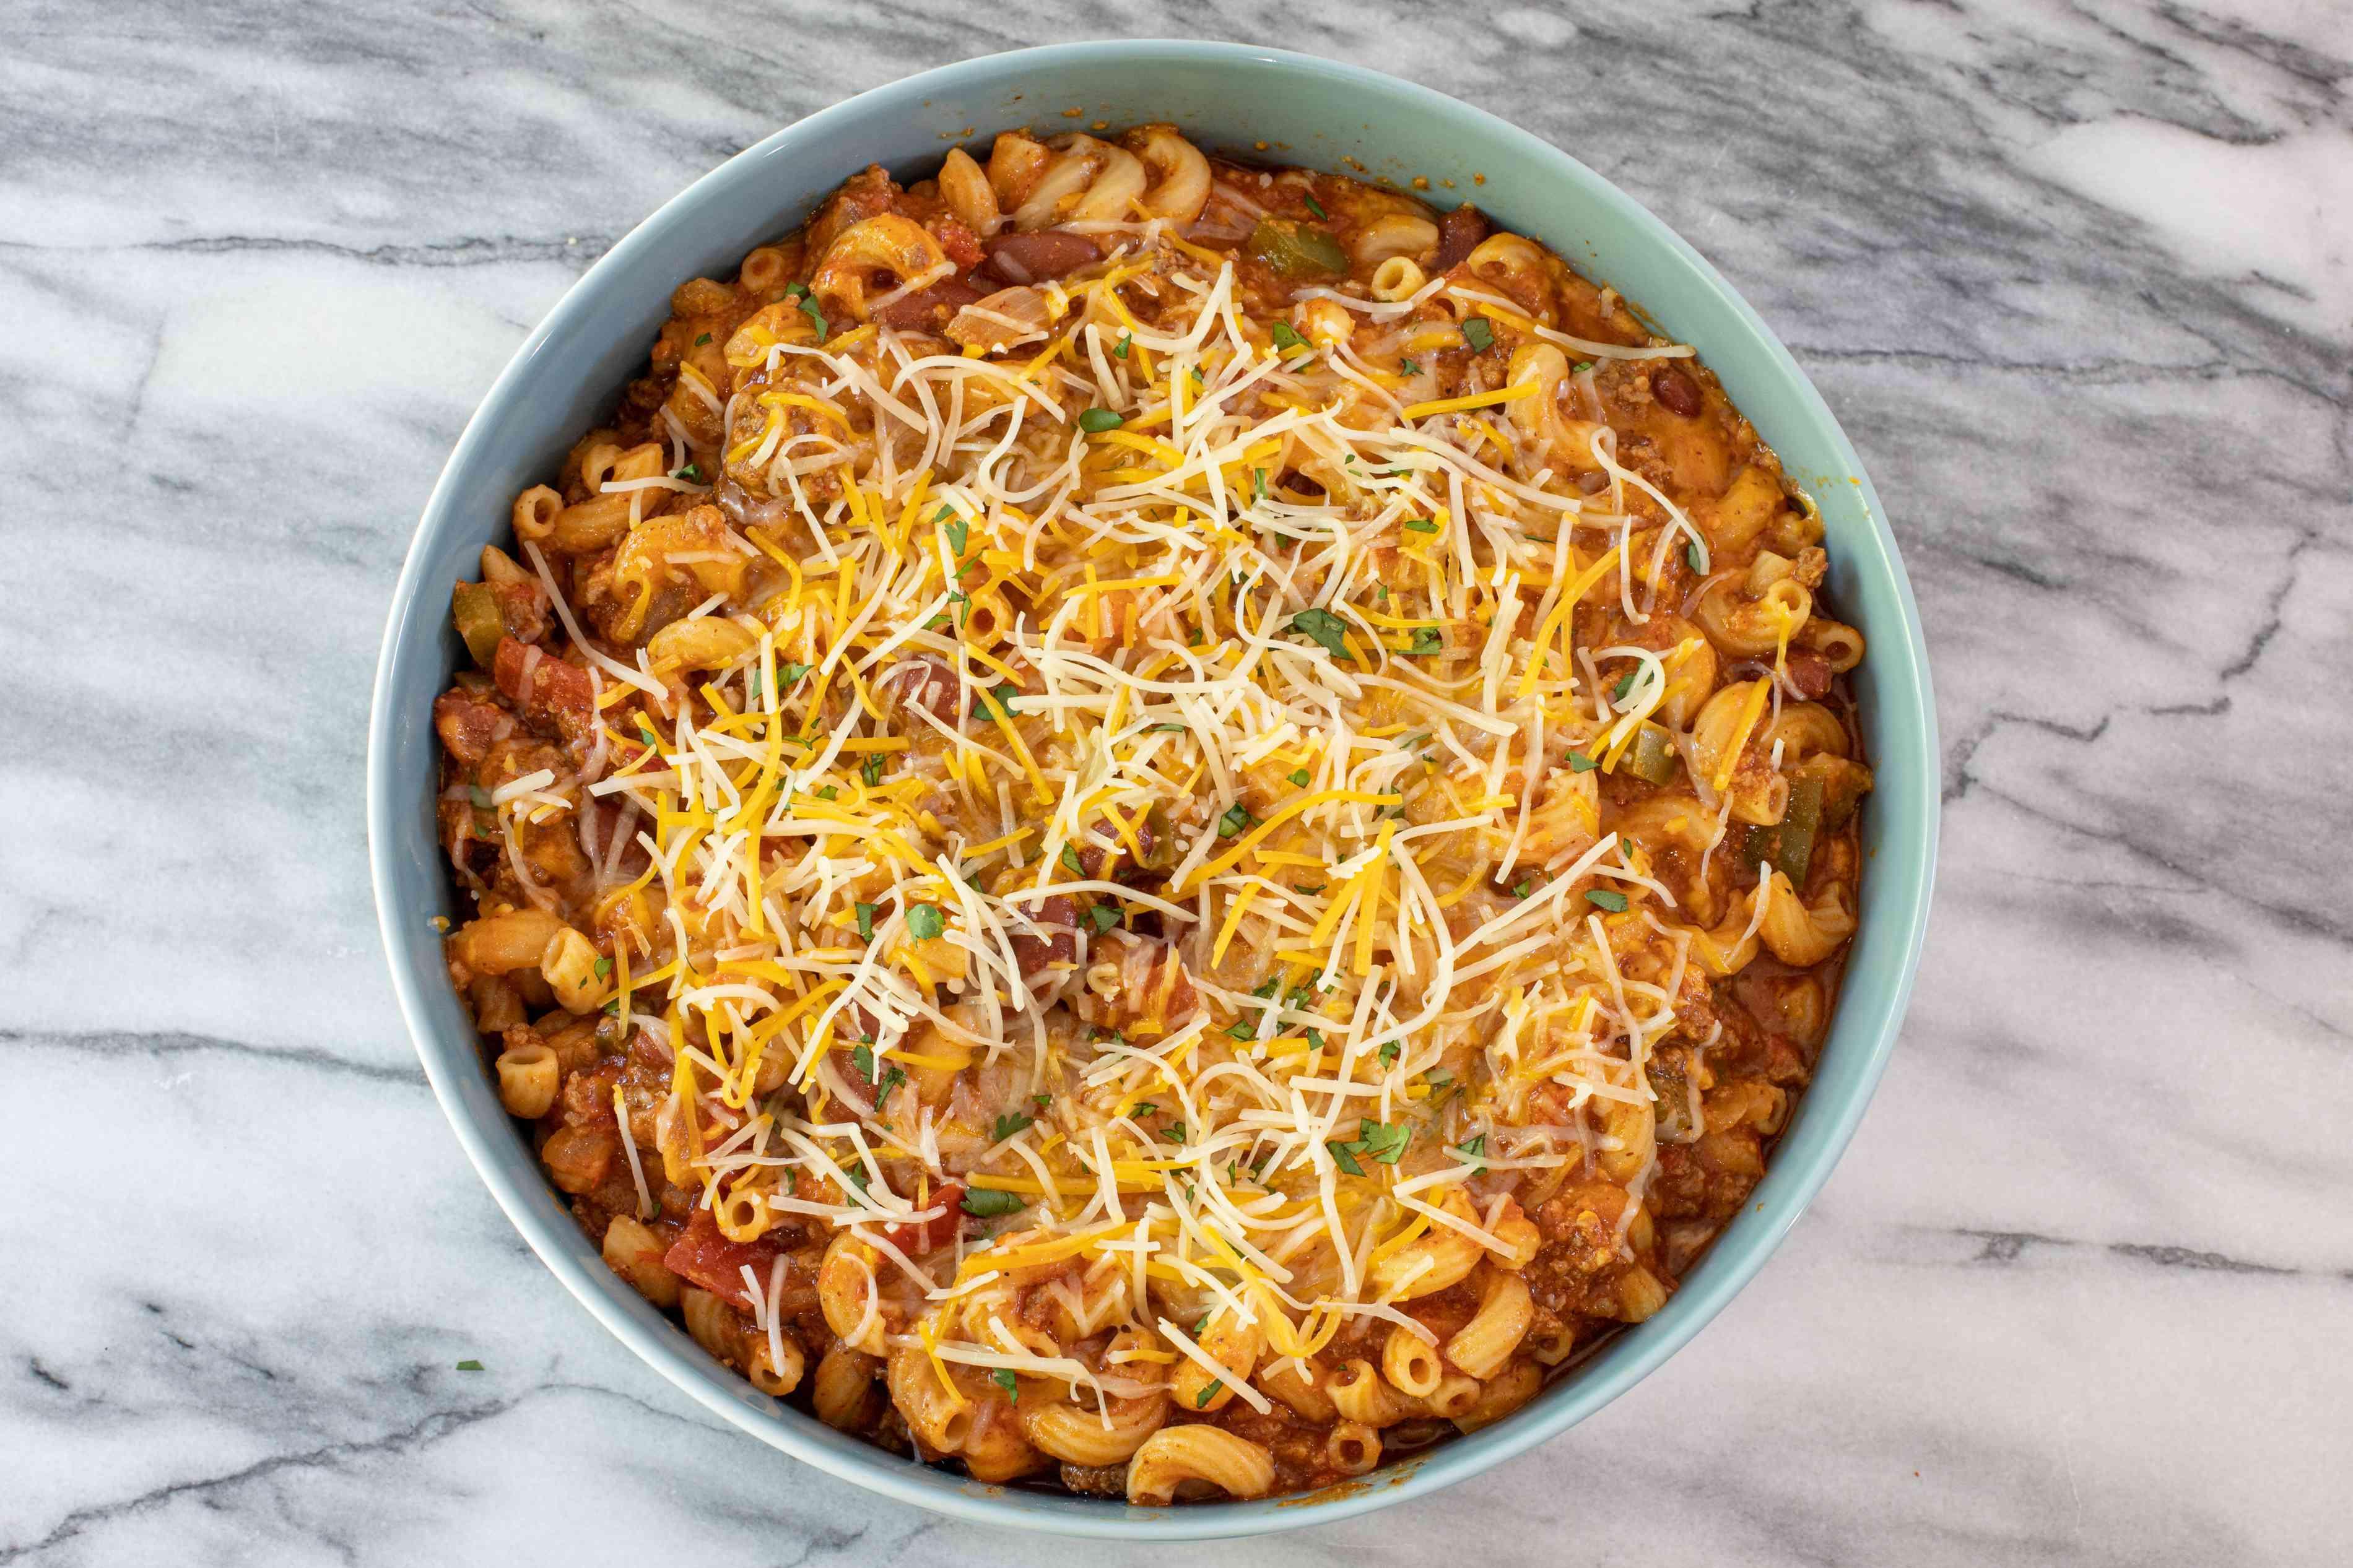 Bowl of spicy chili macaroni and cheese